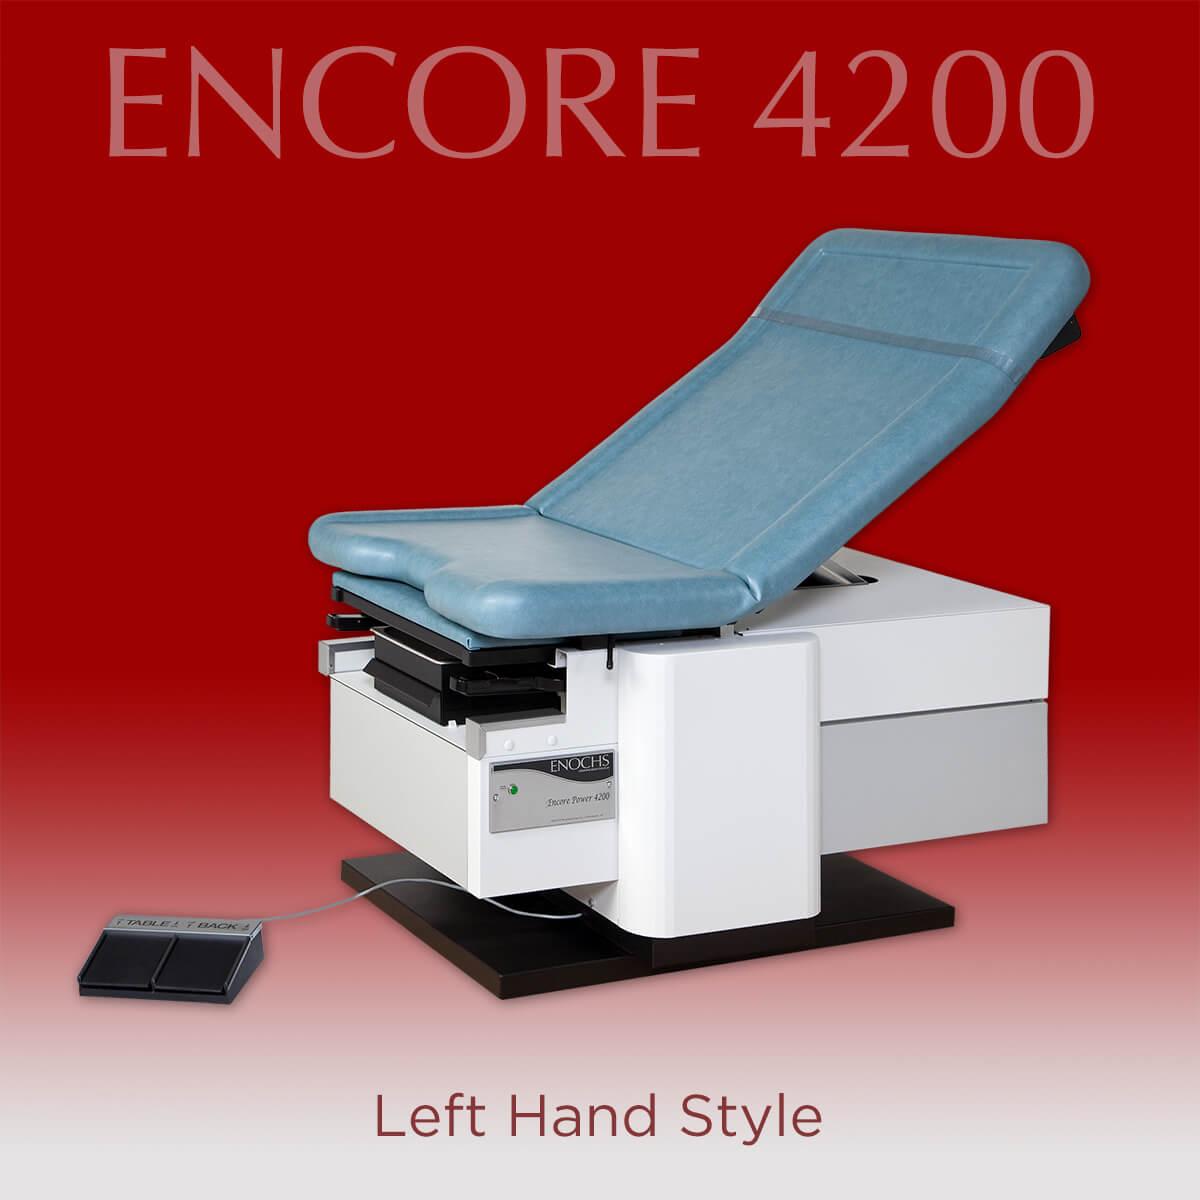 4200-LH-Style.jpg